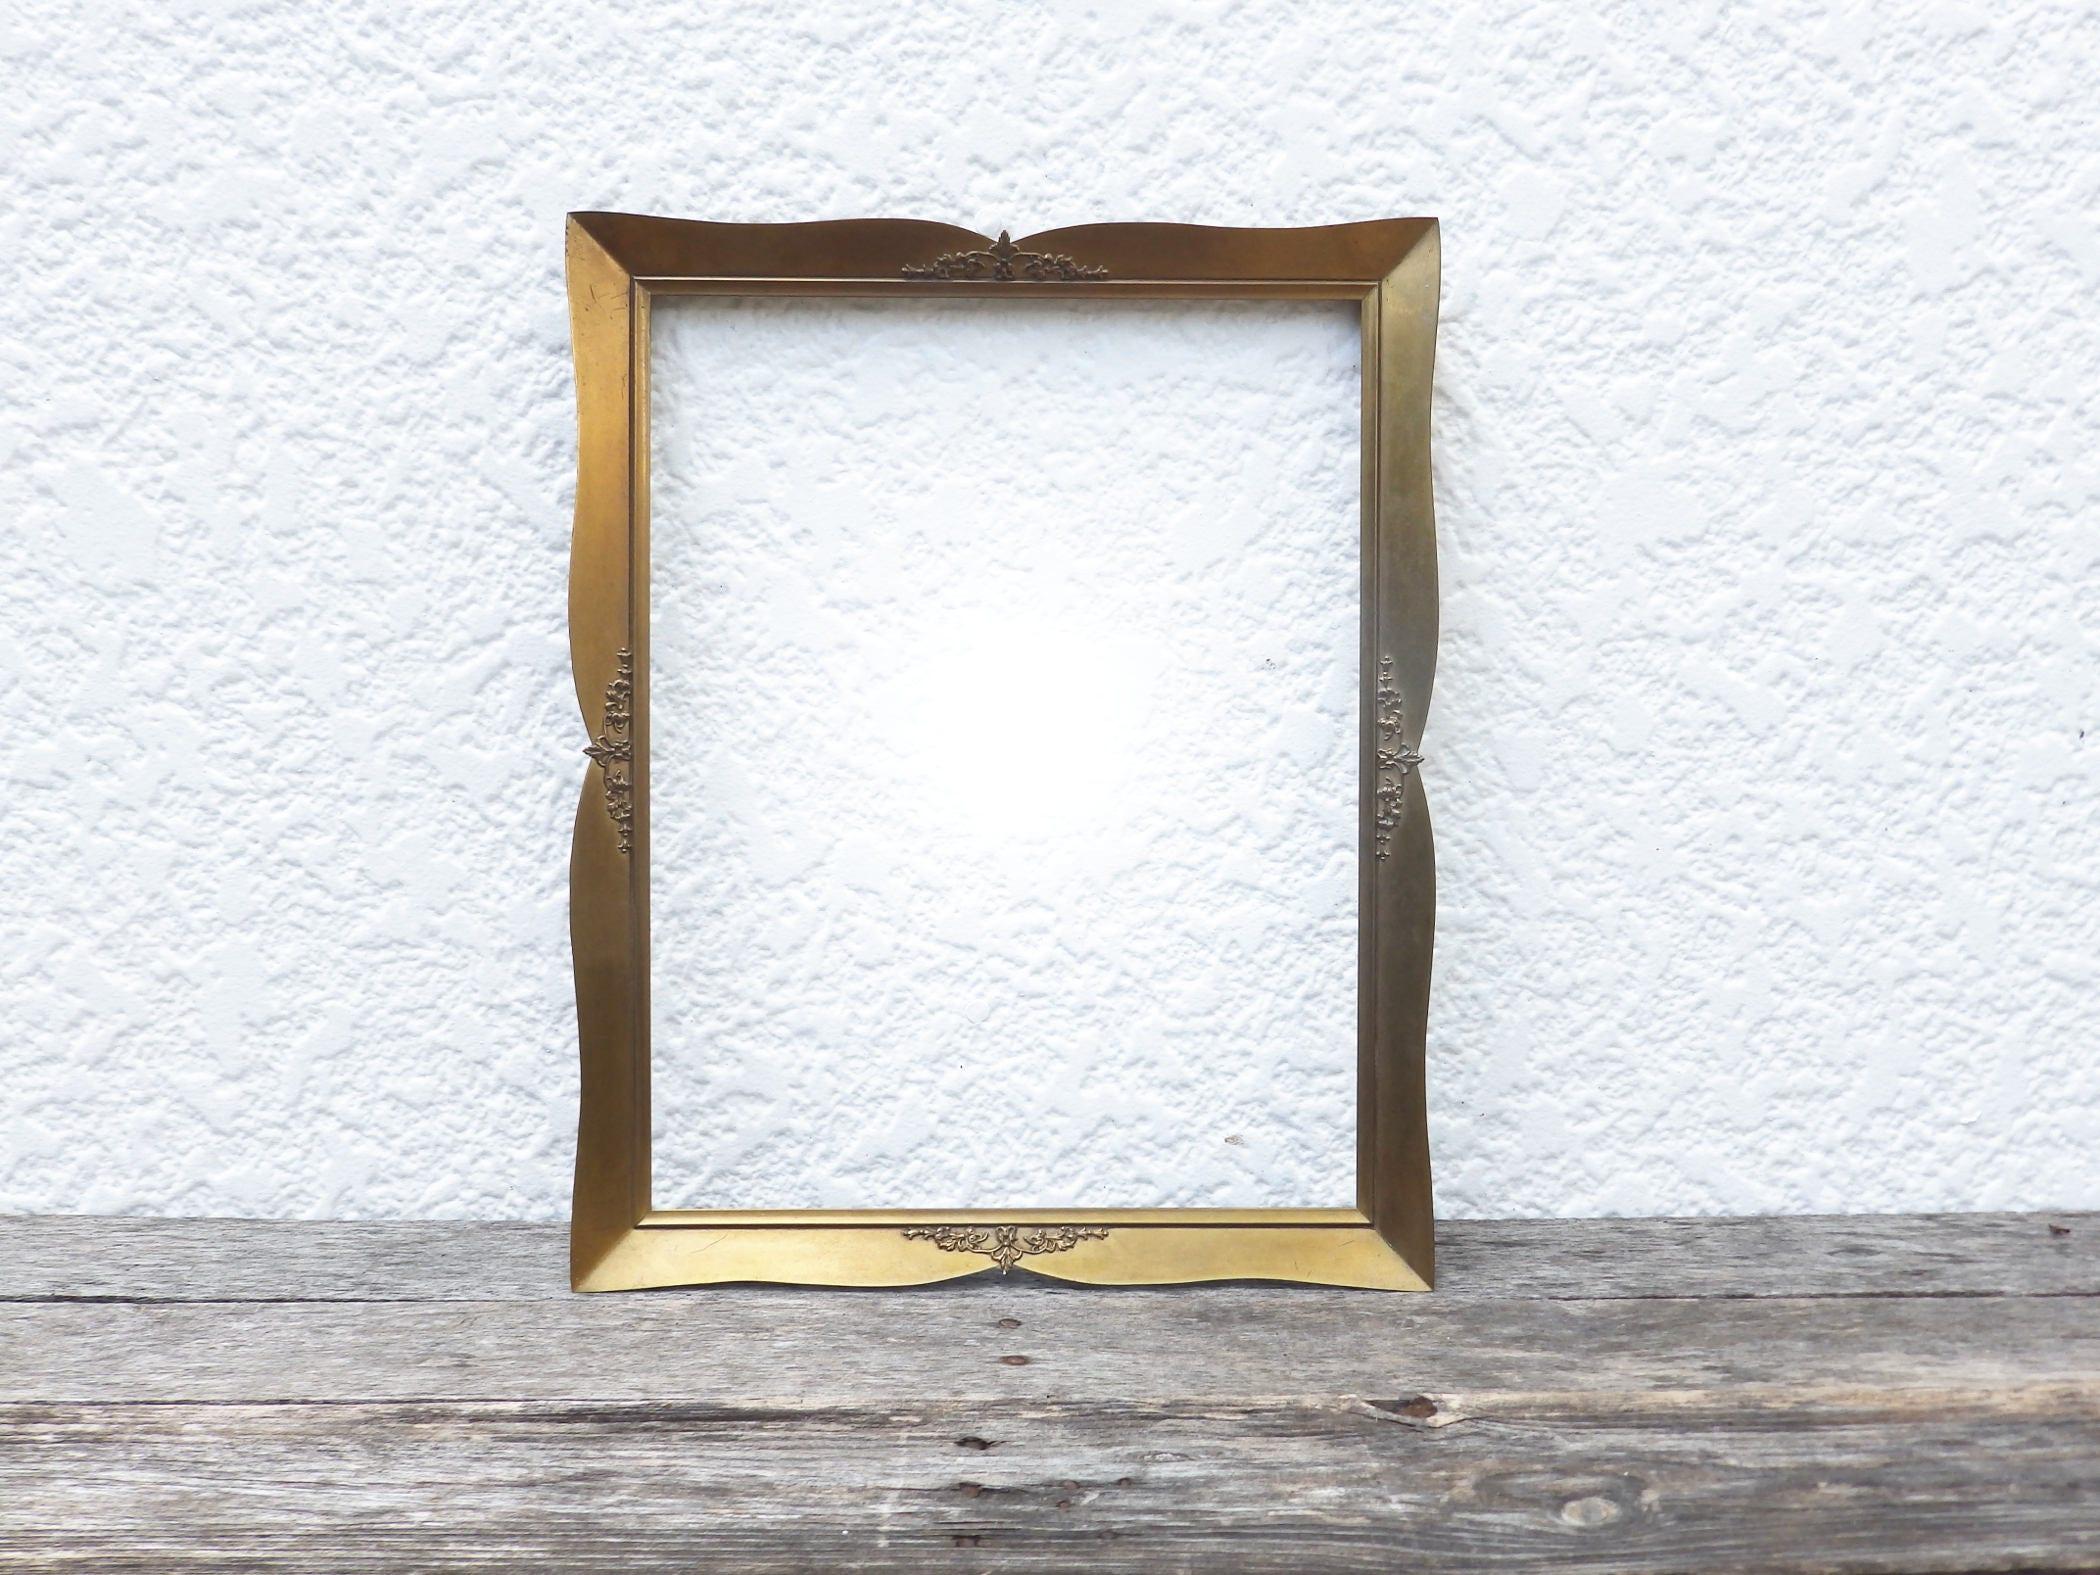 11x14 Ornate Gold Metal Frame - Brass Antique Picture Frame - Art ...